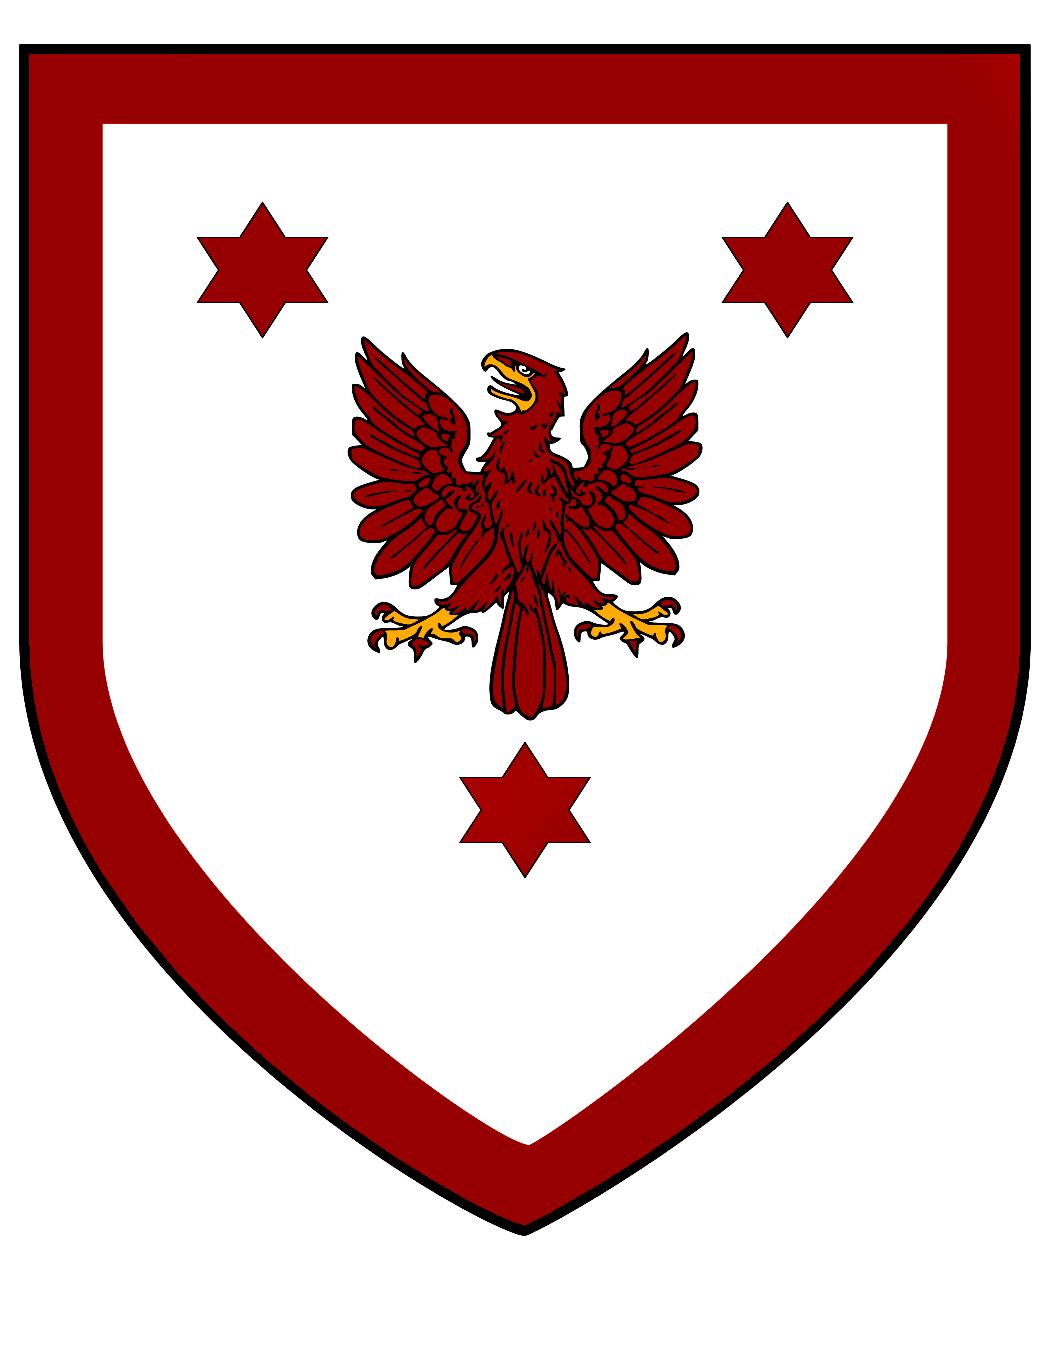 coat_of_arms_August_von_Everstein_of_Halle.png